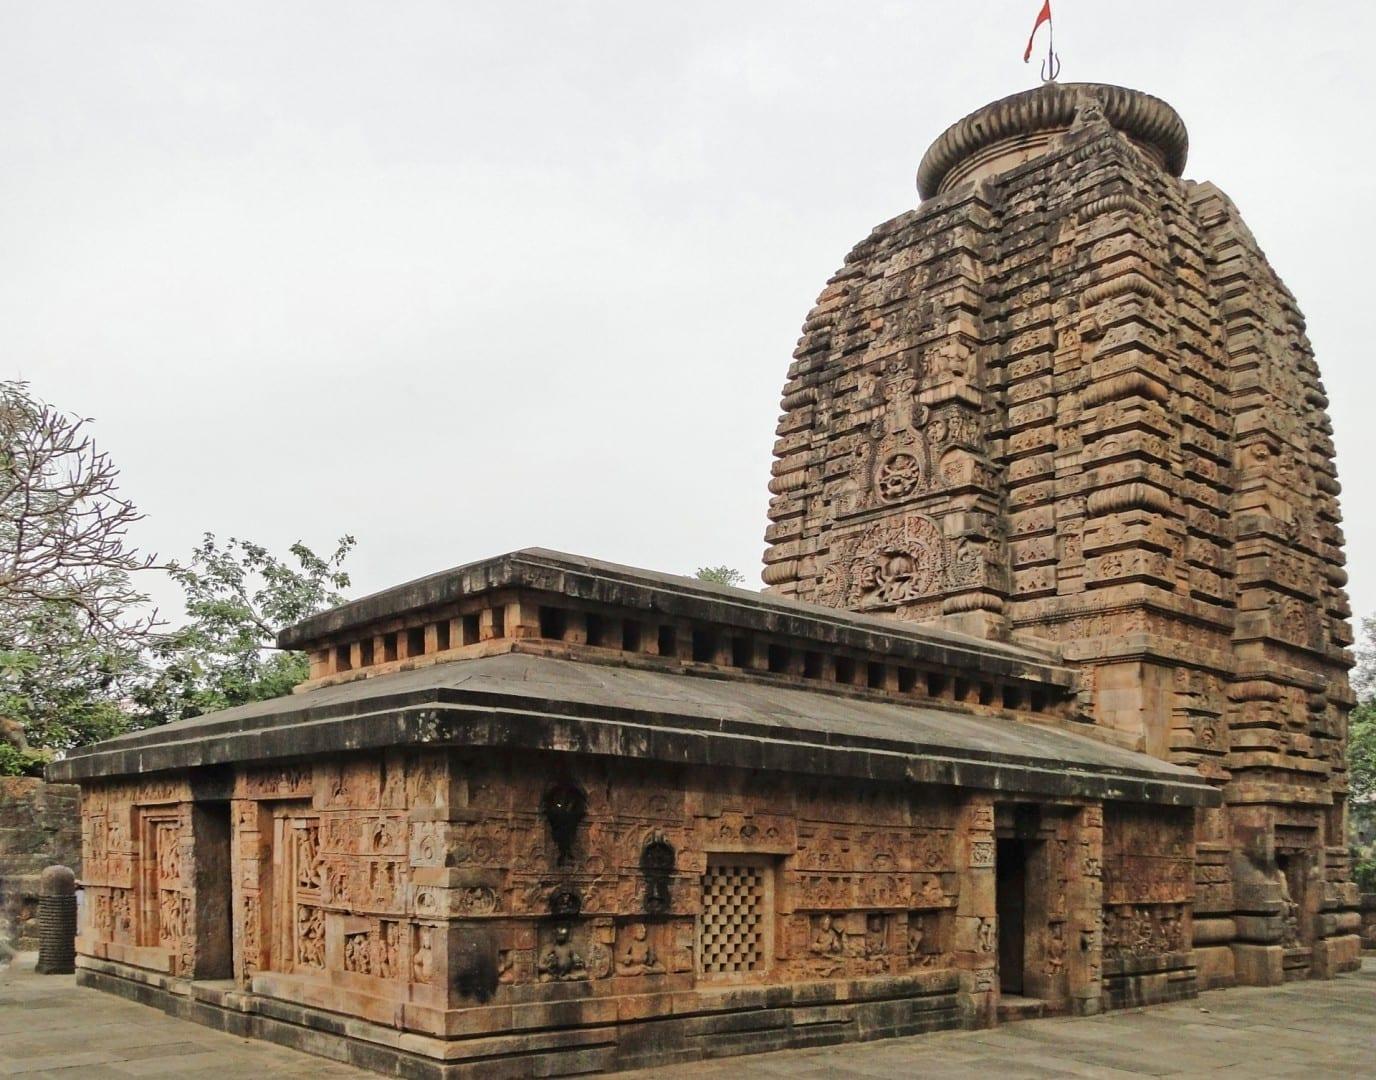 Templo Parasuramesvara Bhubaneswar India